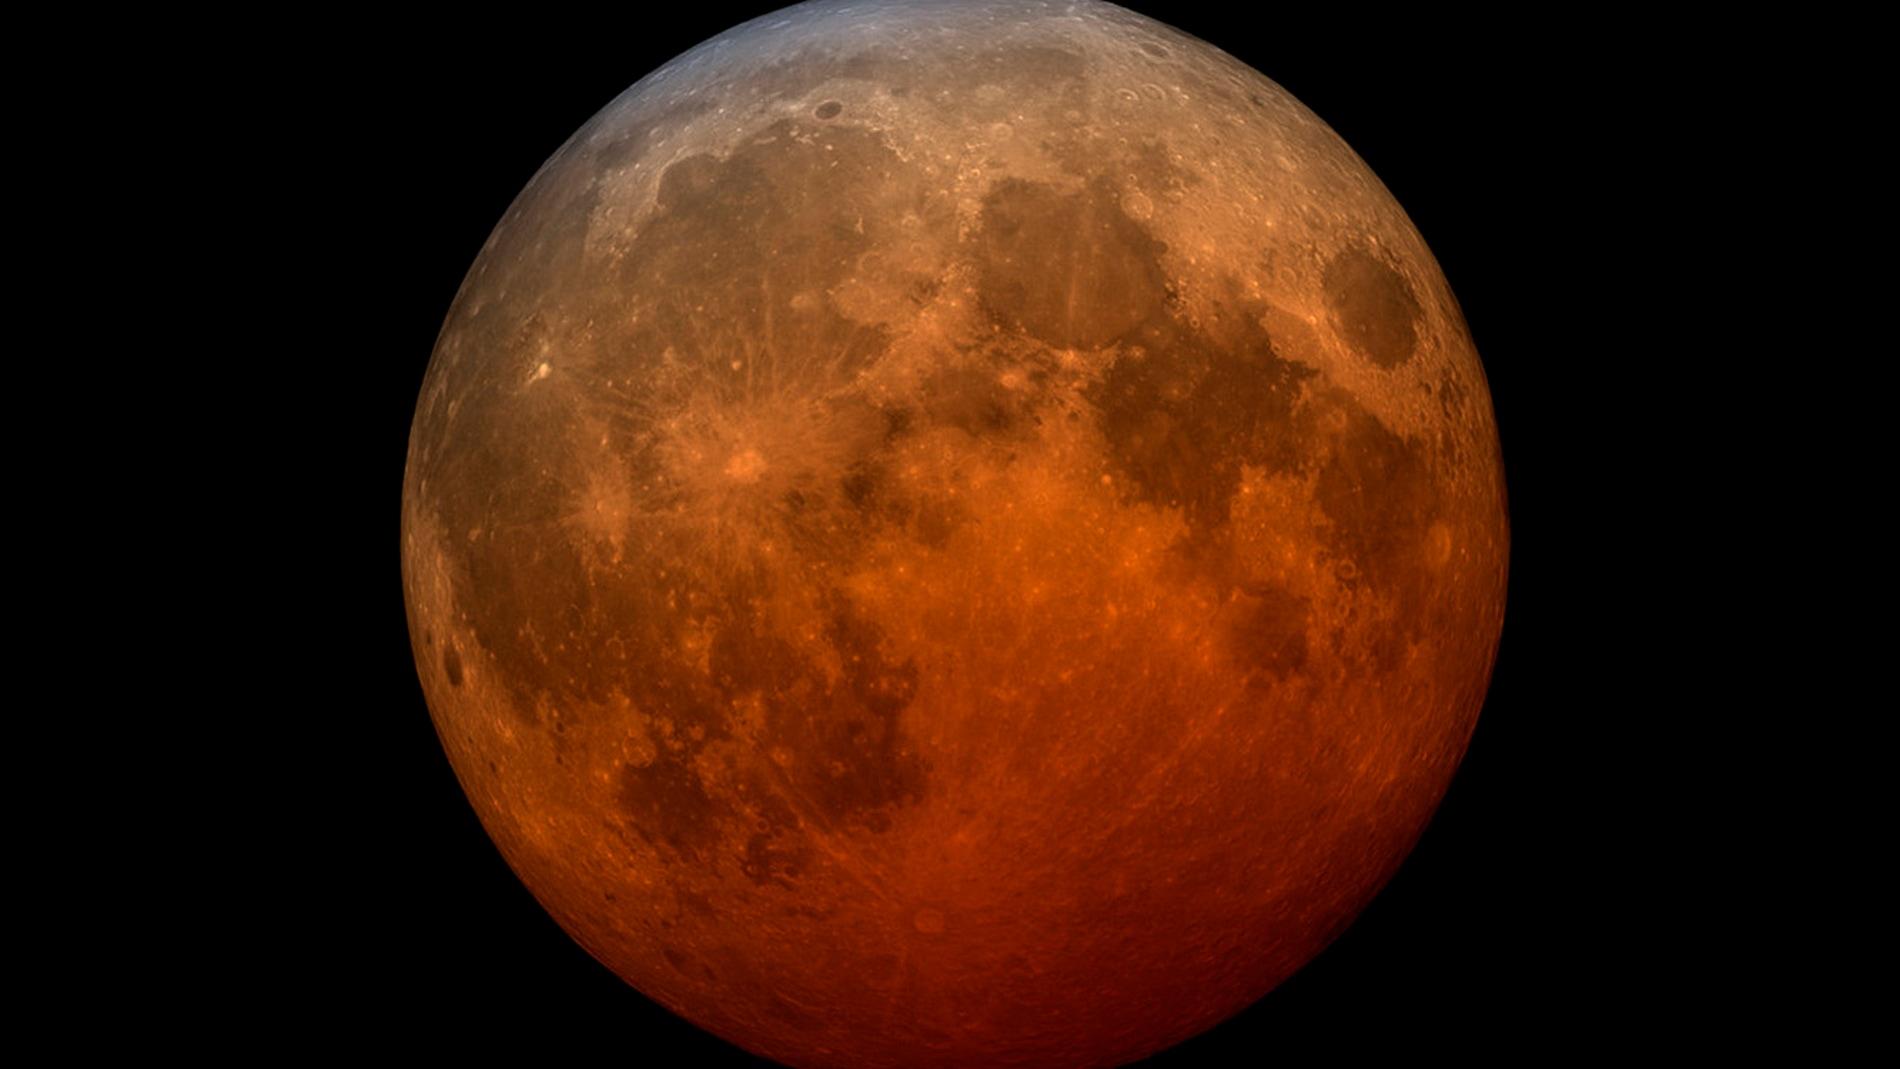 Superluna roja por un eclipse lunar